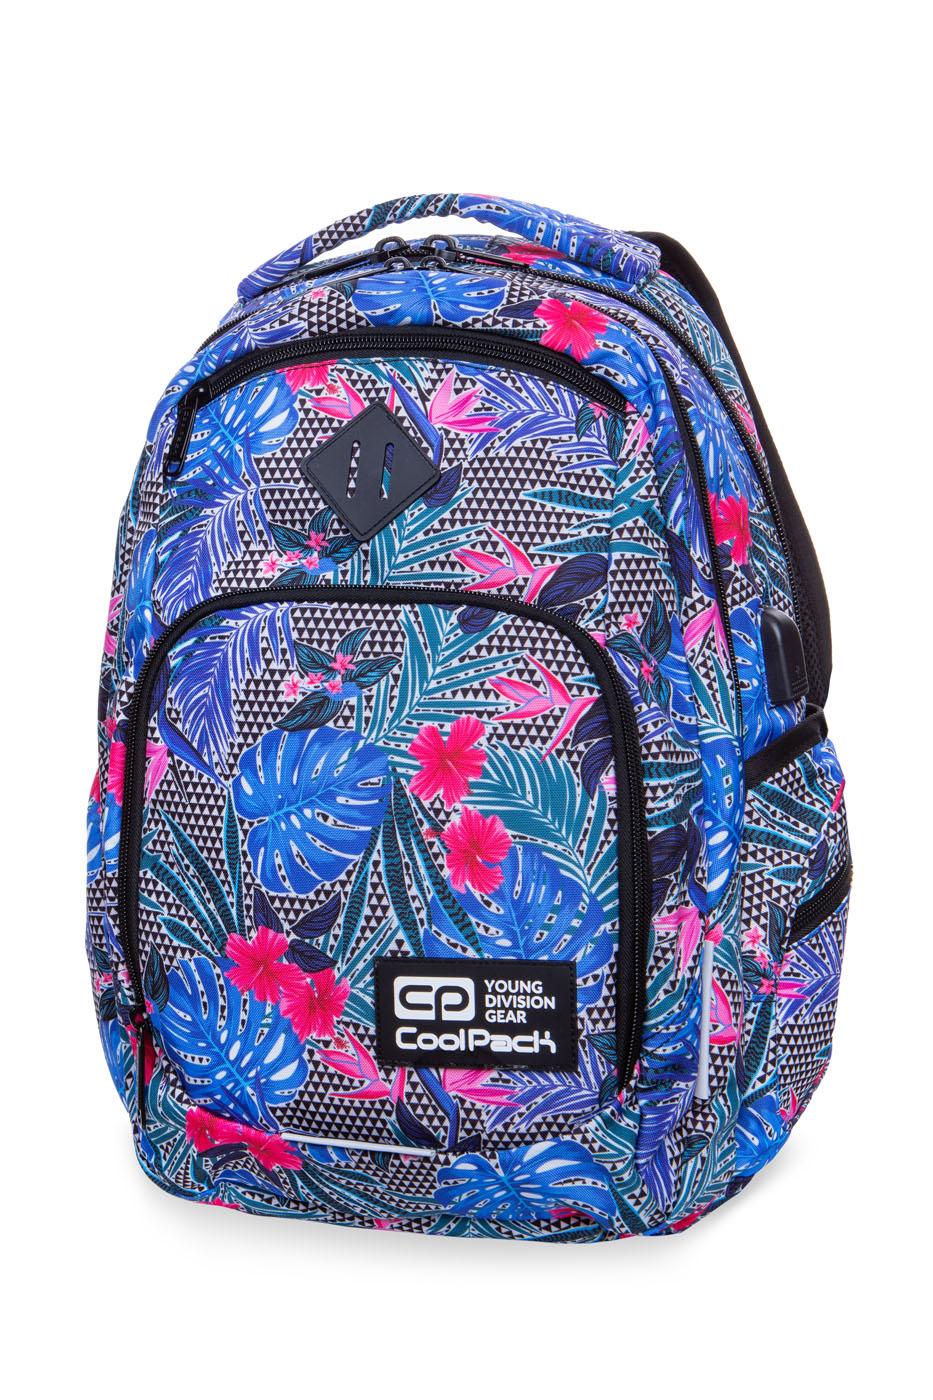 Coolpack   break  rygsæk   aloha blue